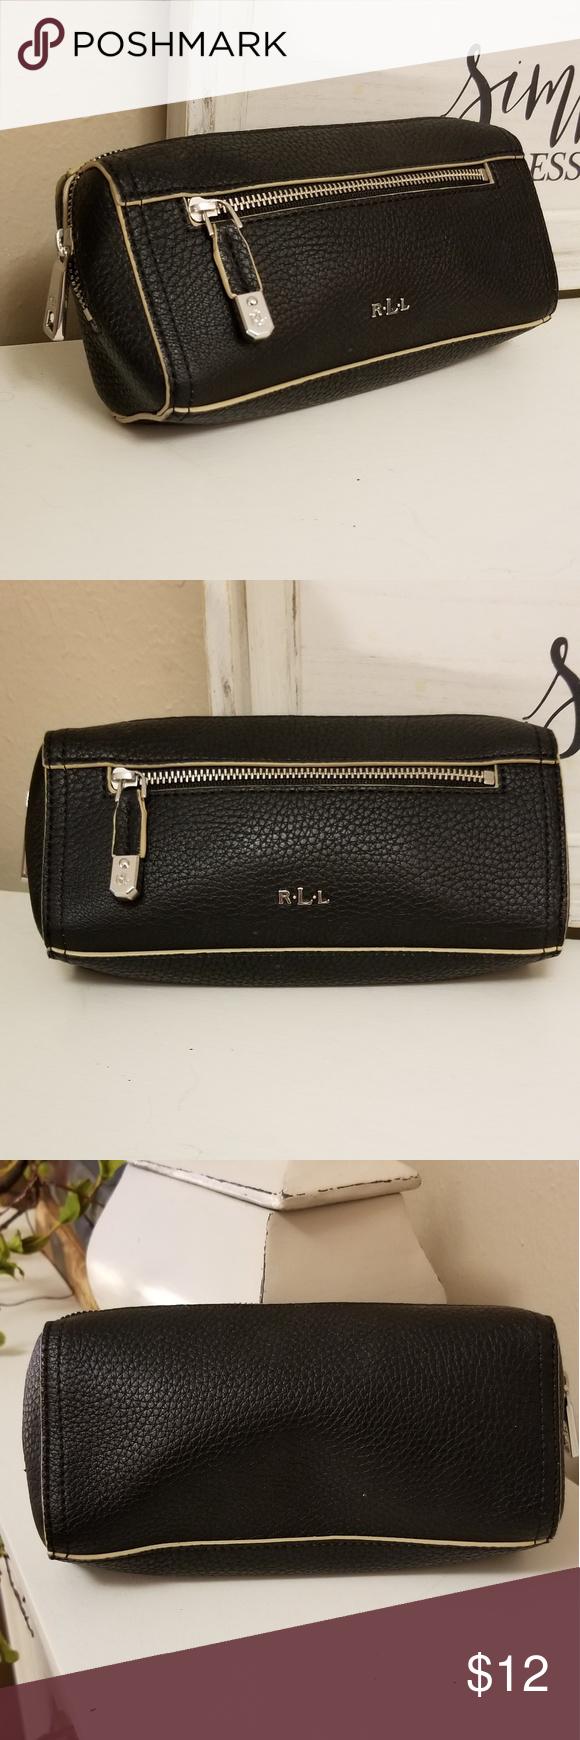 6b68edc62d6b Ralph Lauren cosmetic bag Ralph Lauren cosmetic bag black pebble grain  leather Ralph Lauren Bags Cosmetic Bags   Cases